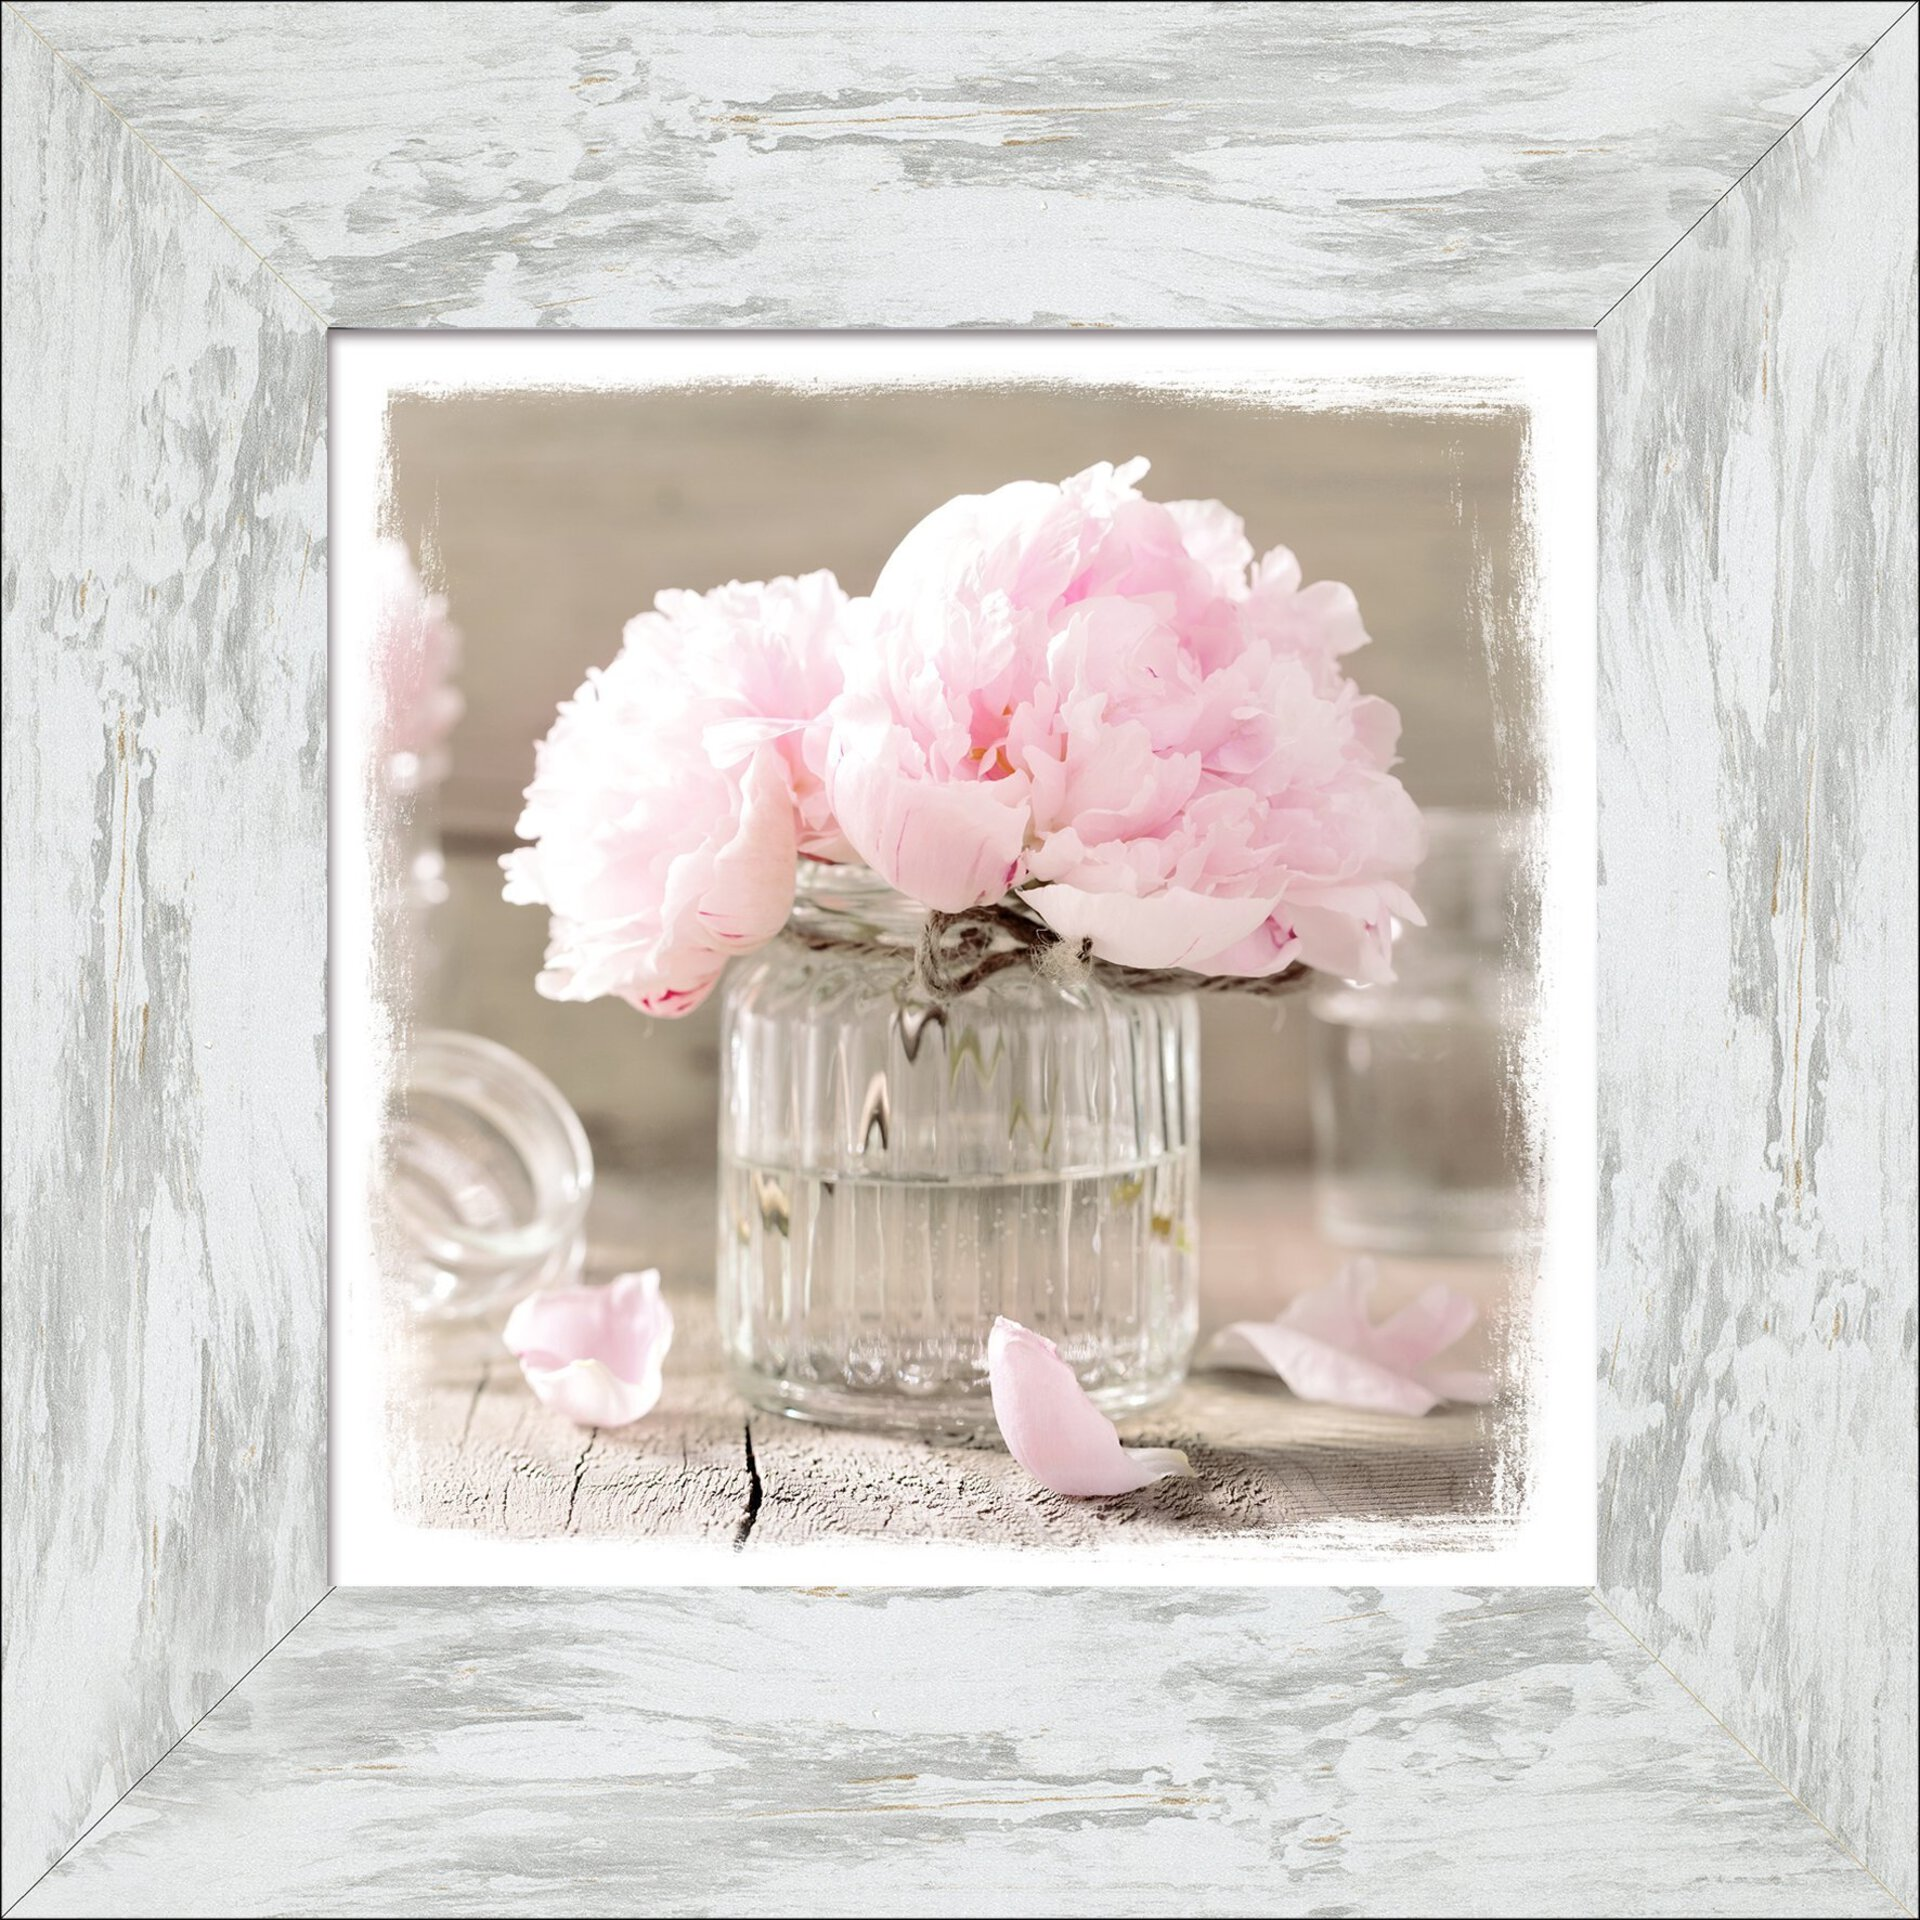 Bild Rose Flowers Pro-Art Holzwerkstoff 44 x 44 x 1 cm